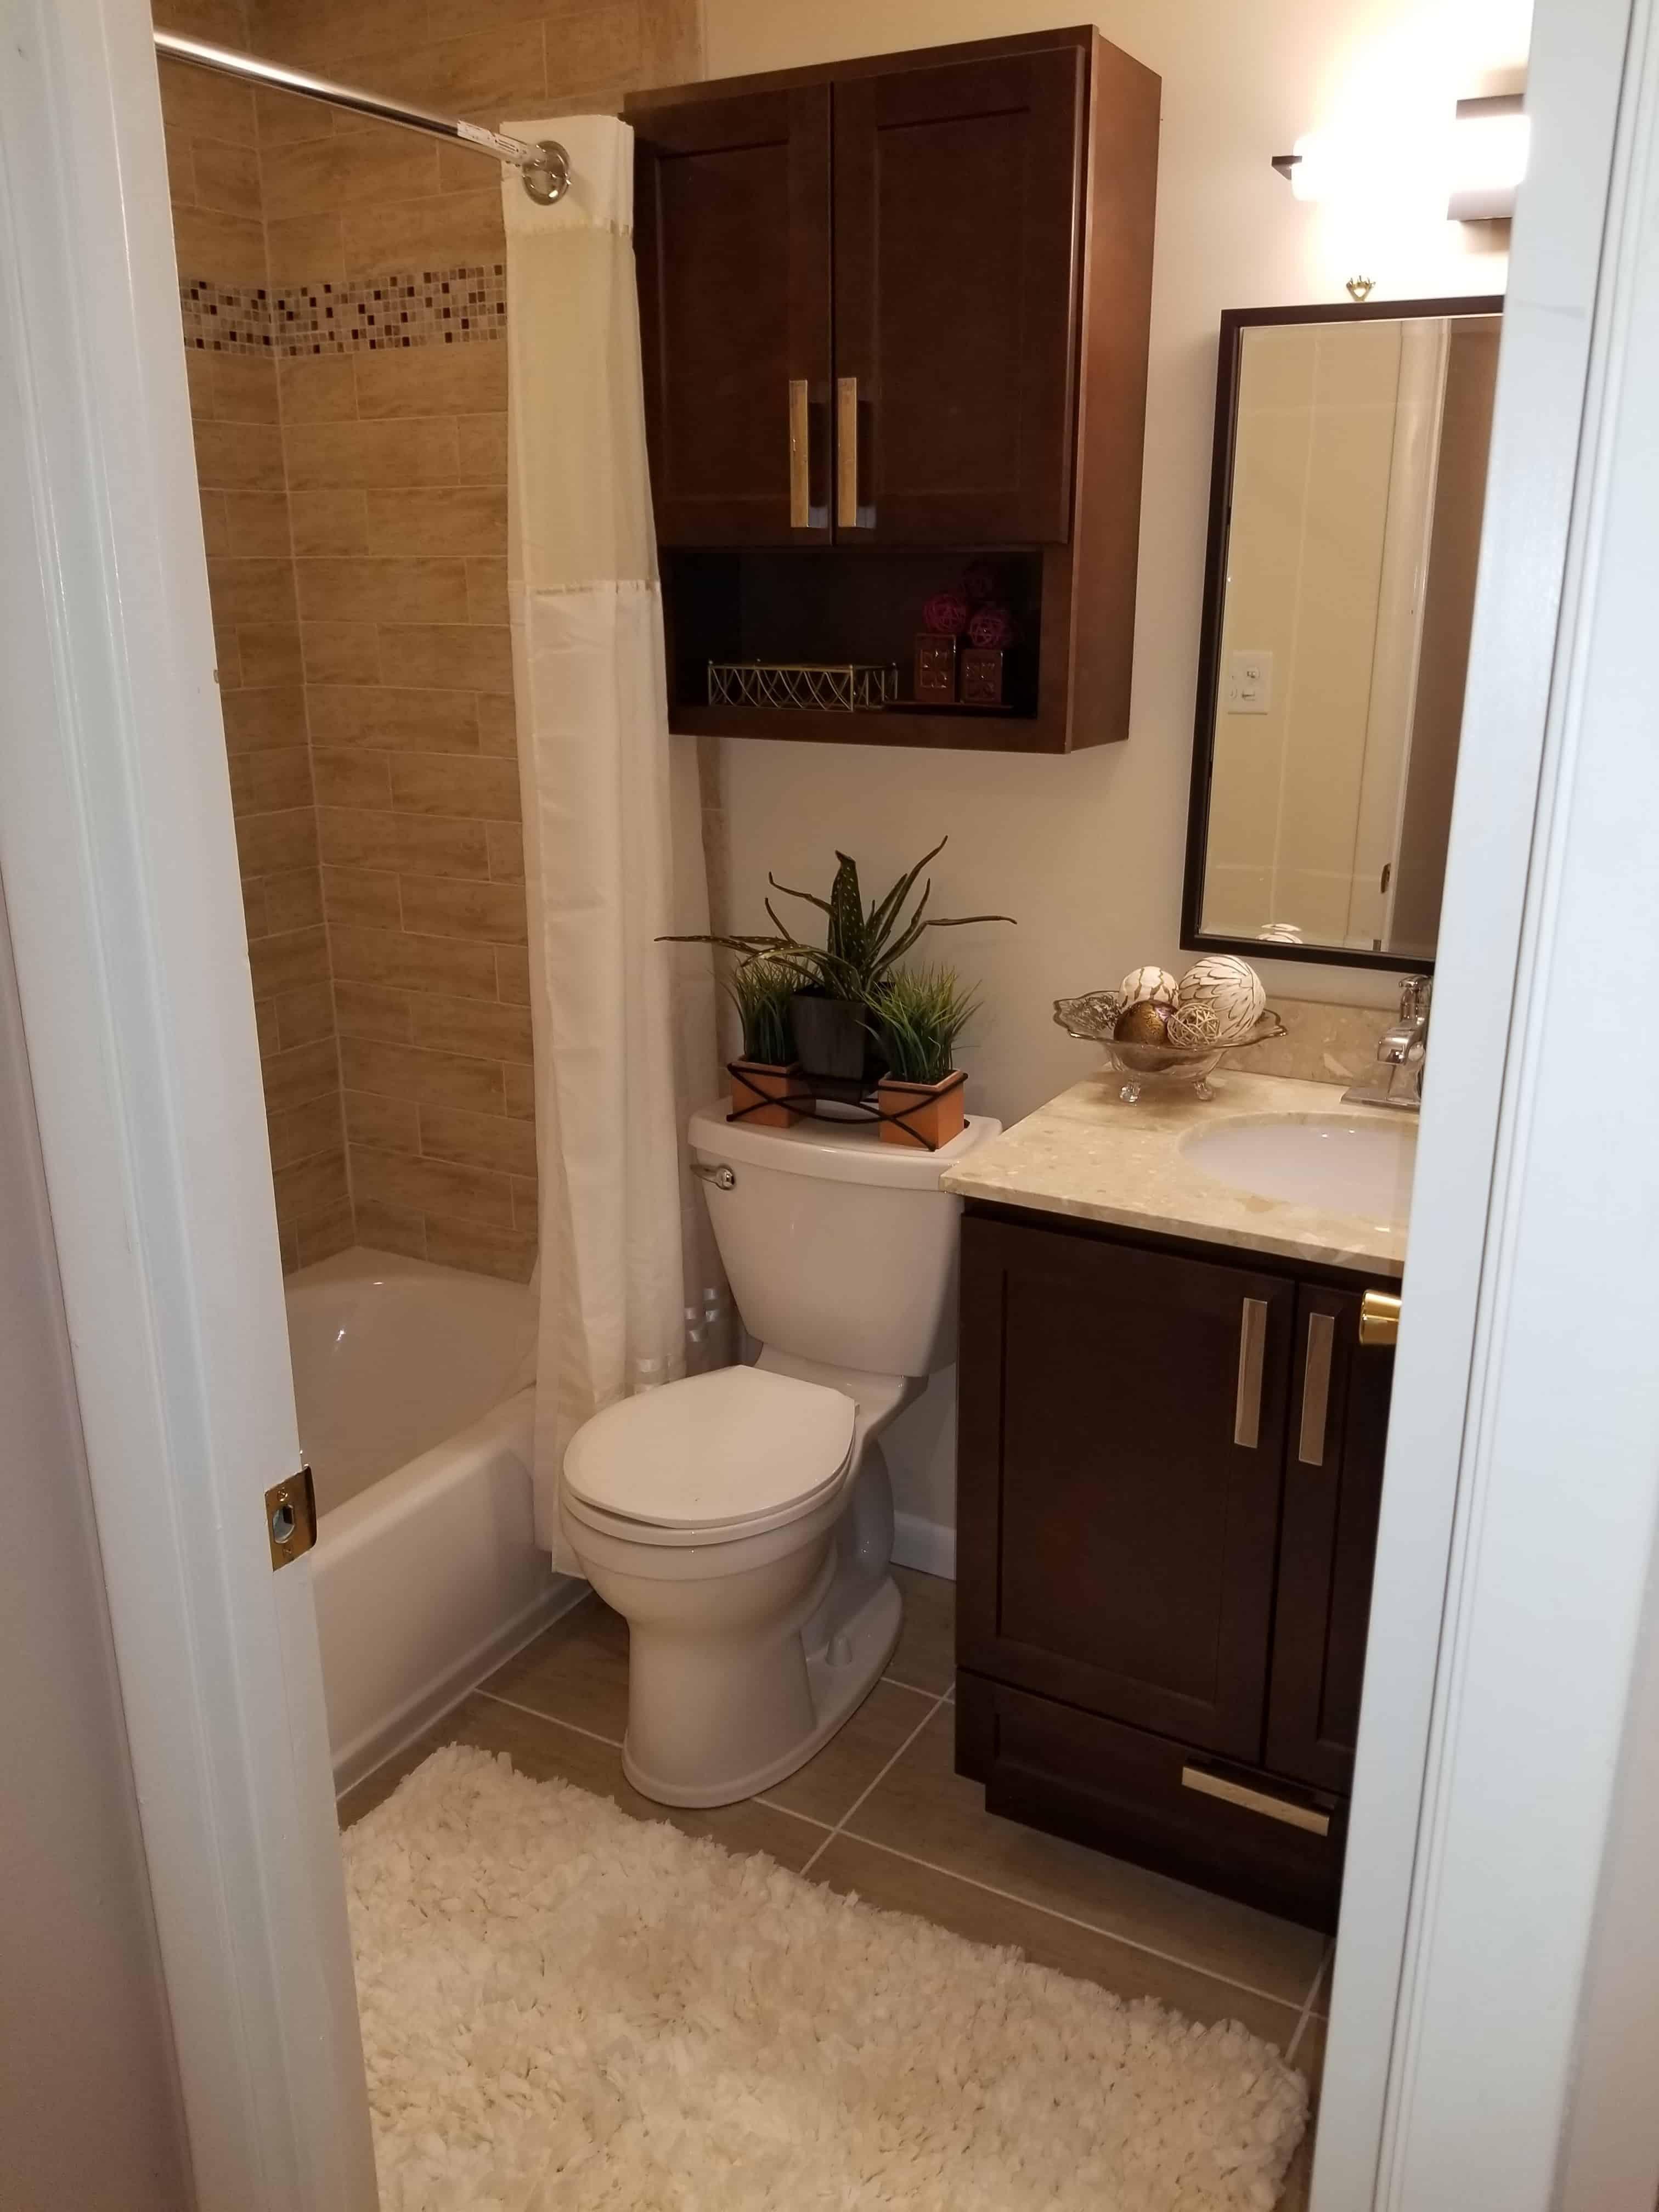 https://0201.nccdn.net/1_2/000/000/0c7/cd6/BathroomIdeas-min-3024x4032.jpg